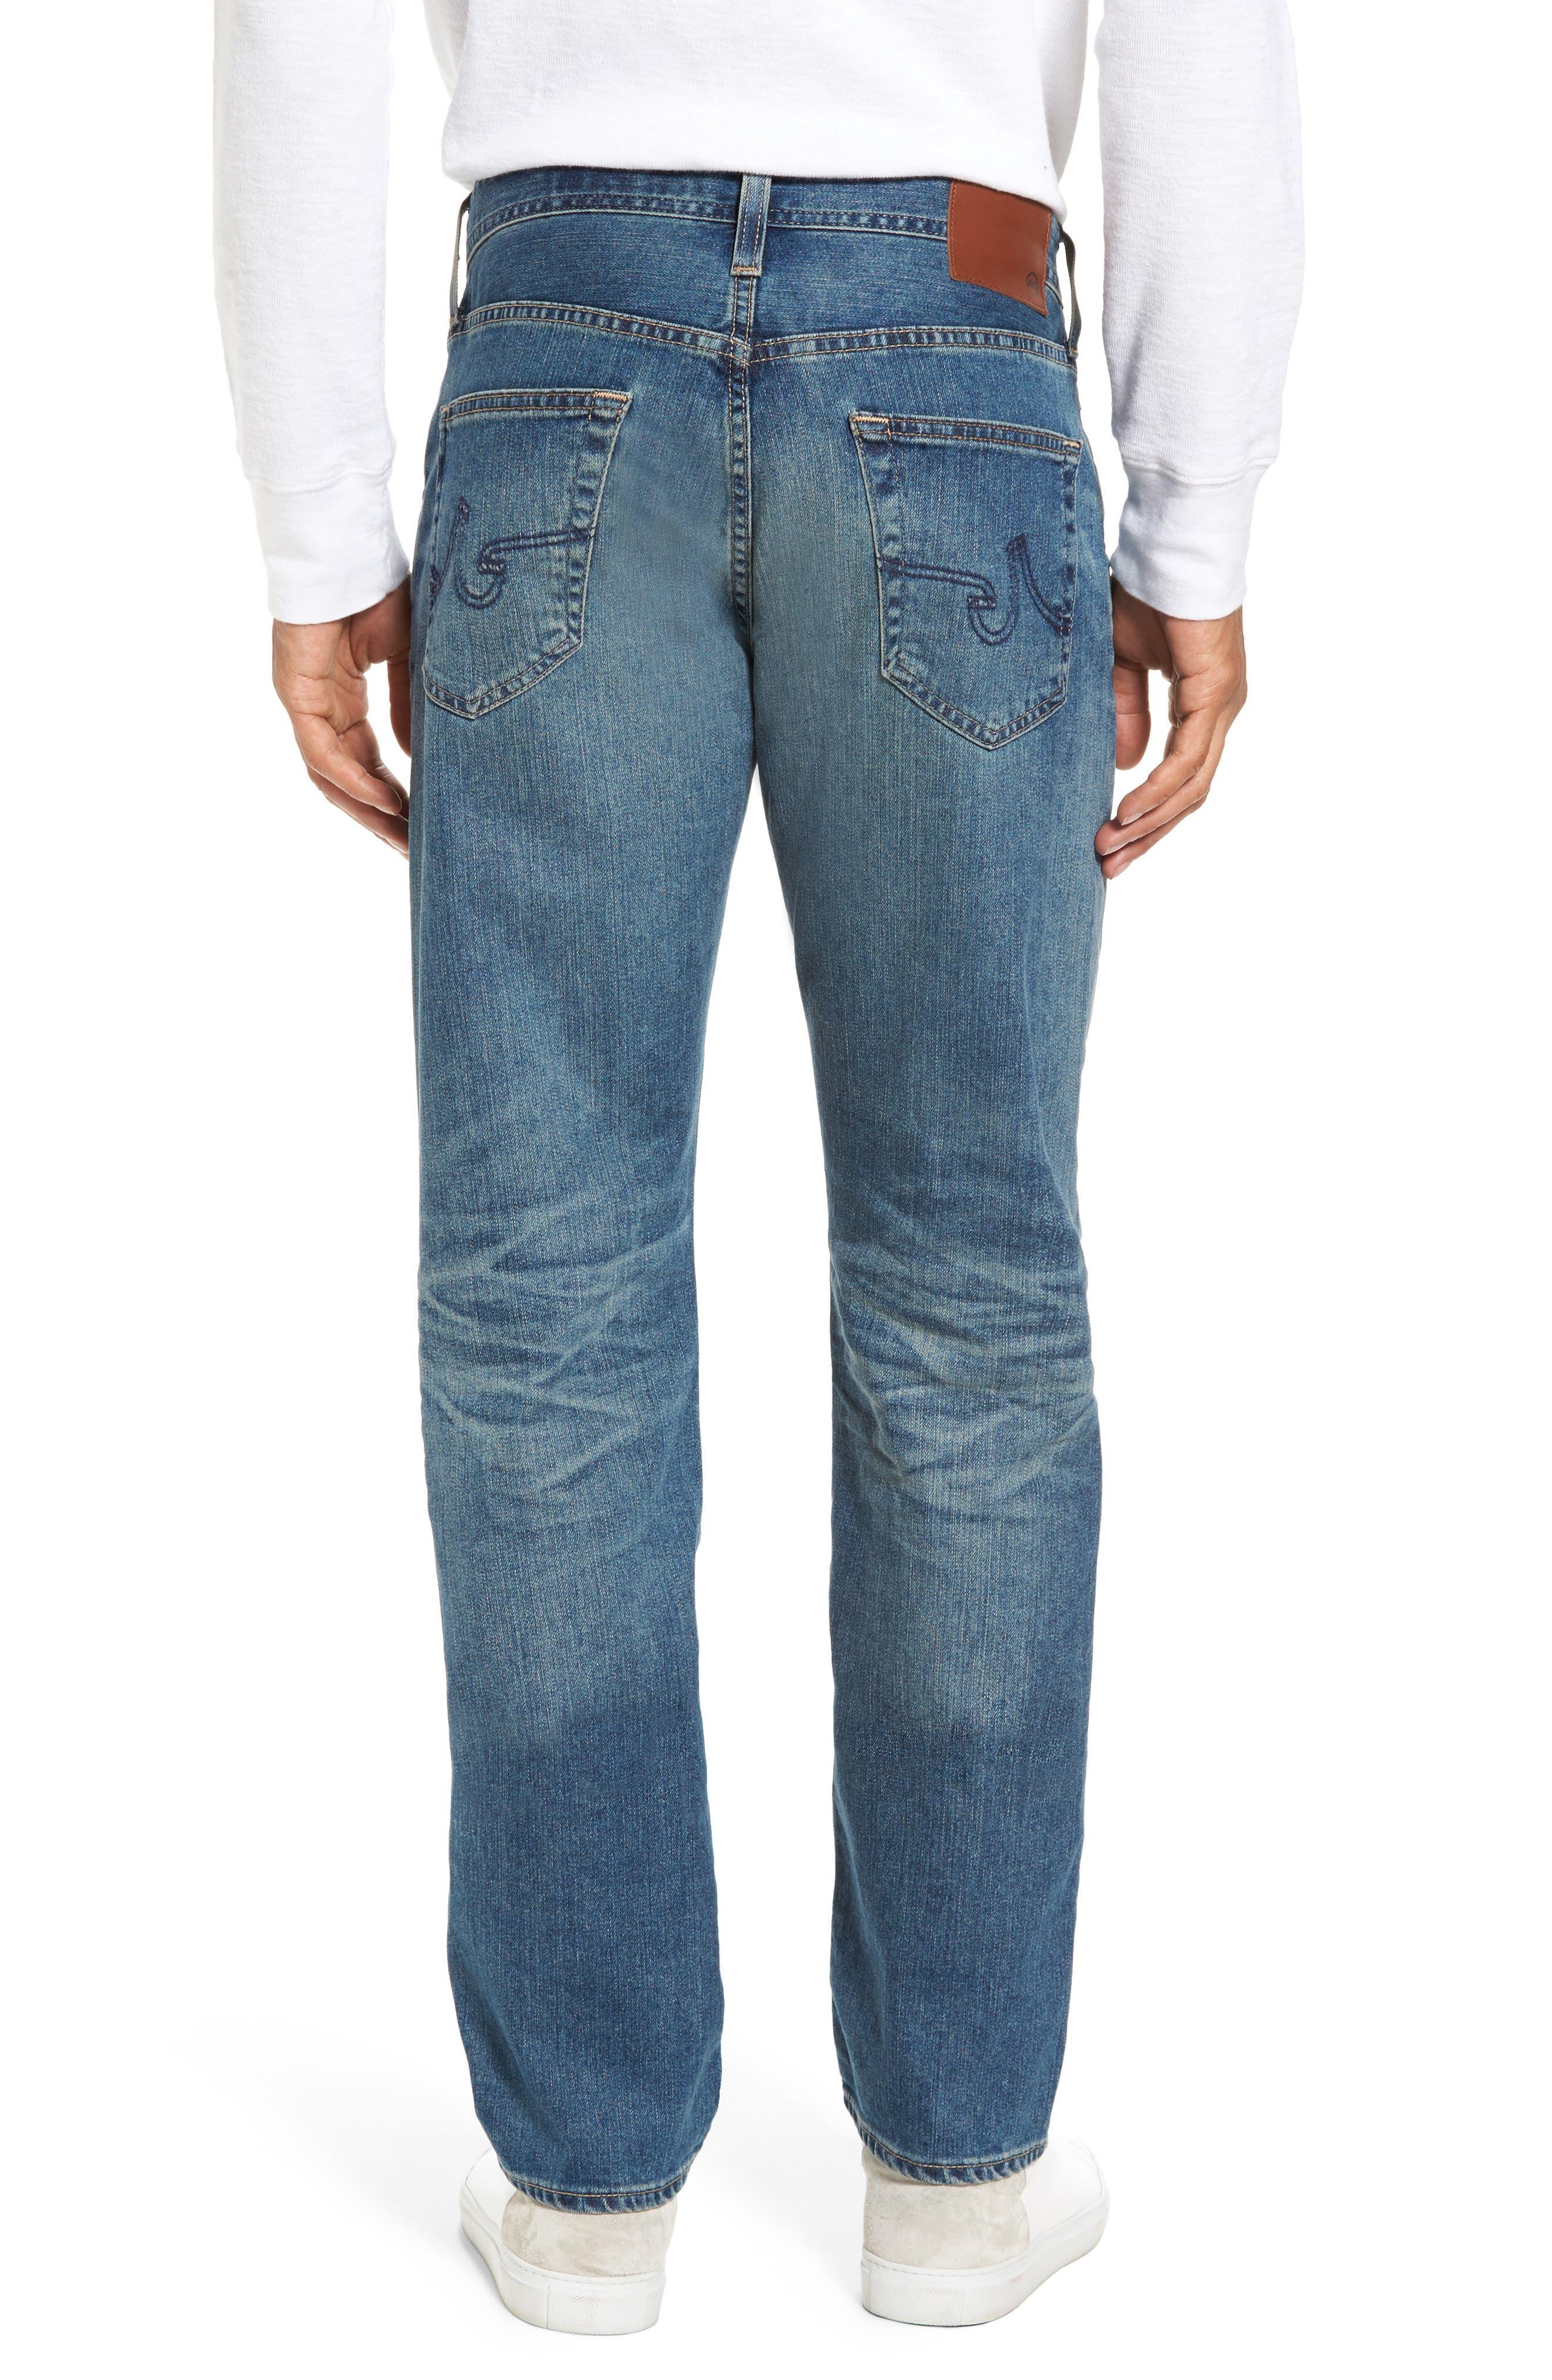 Graduate Slim Straight Leg Jeans,                             Alternate thumbnail 2, color,                             14 Years Century